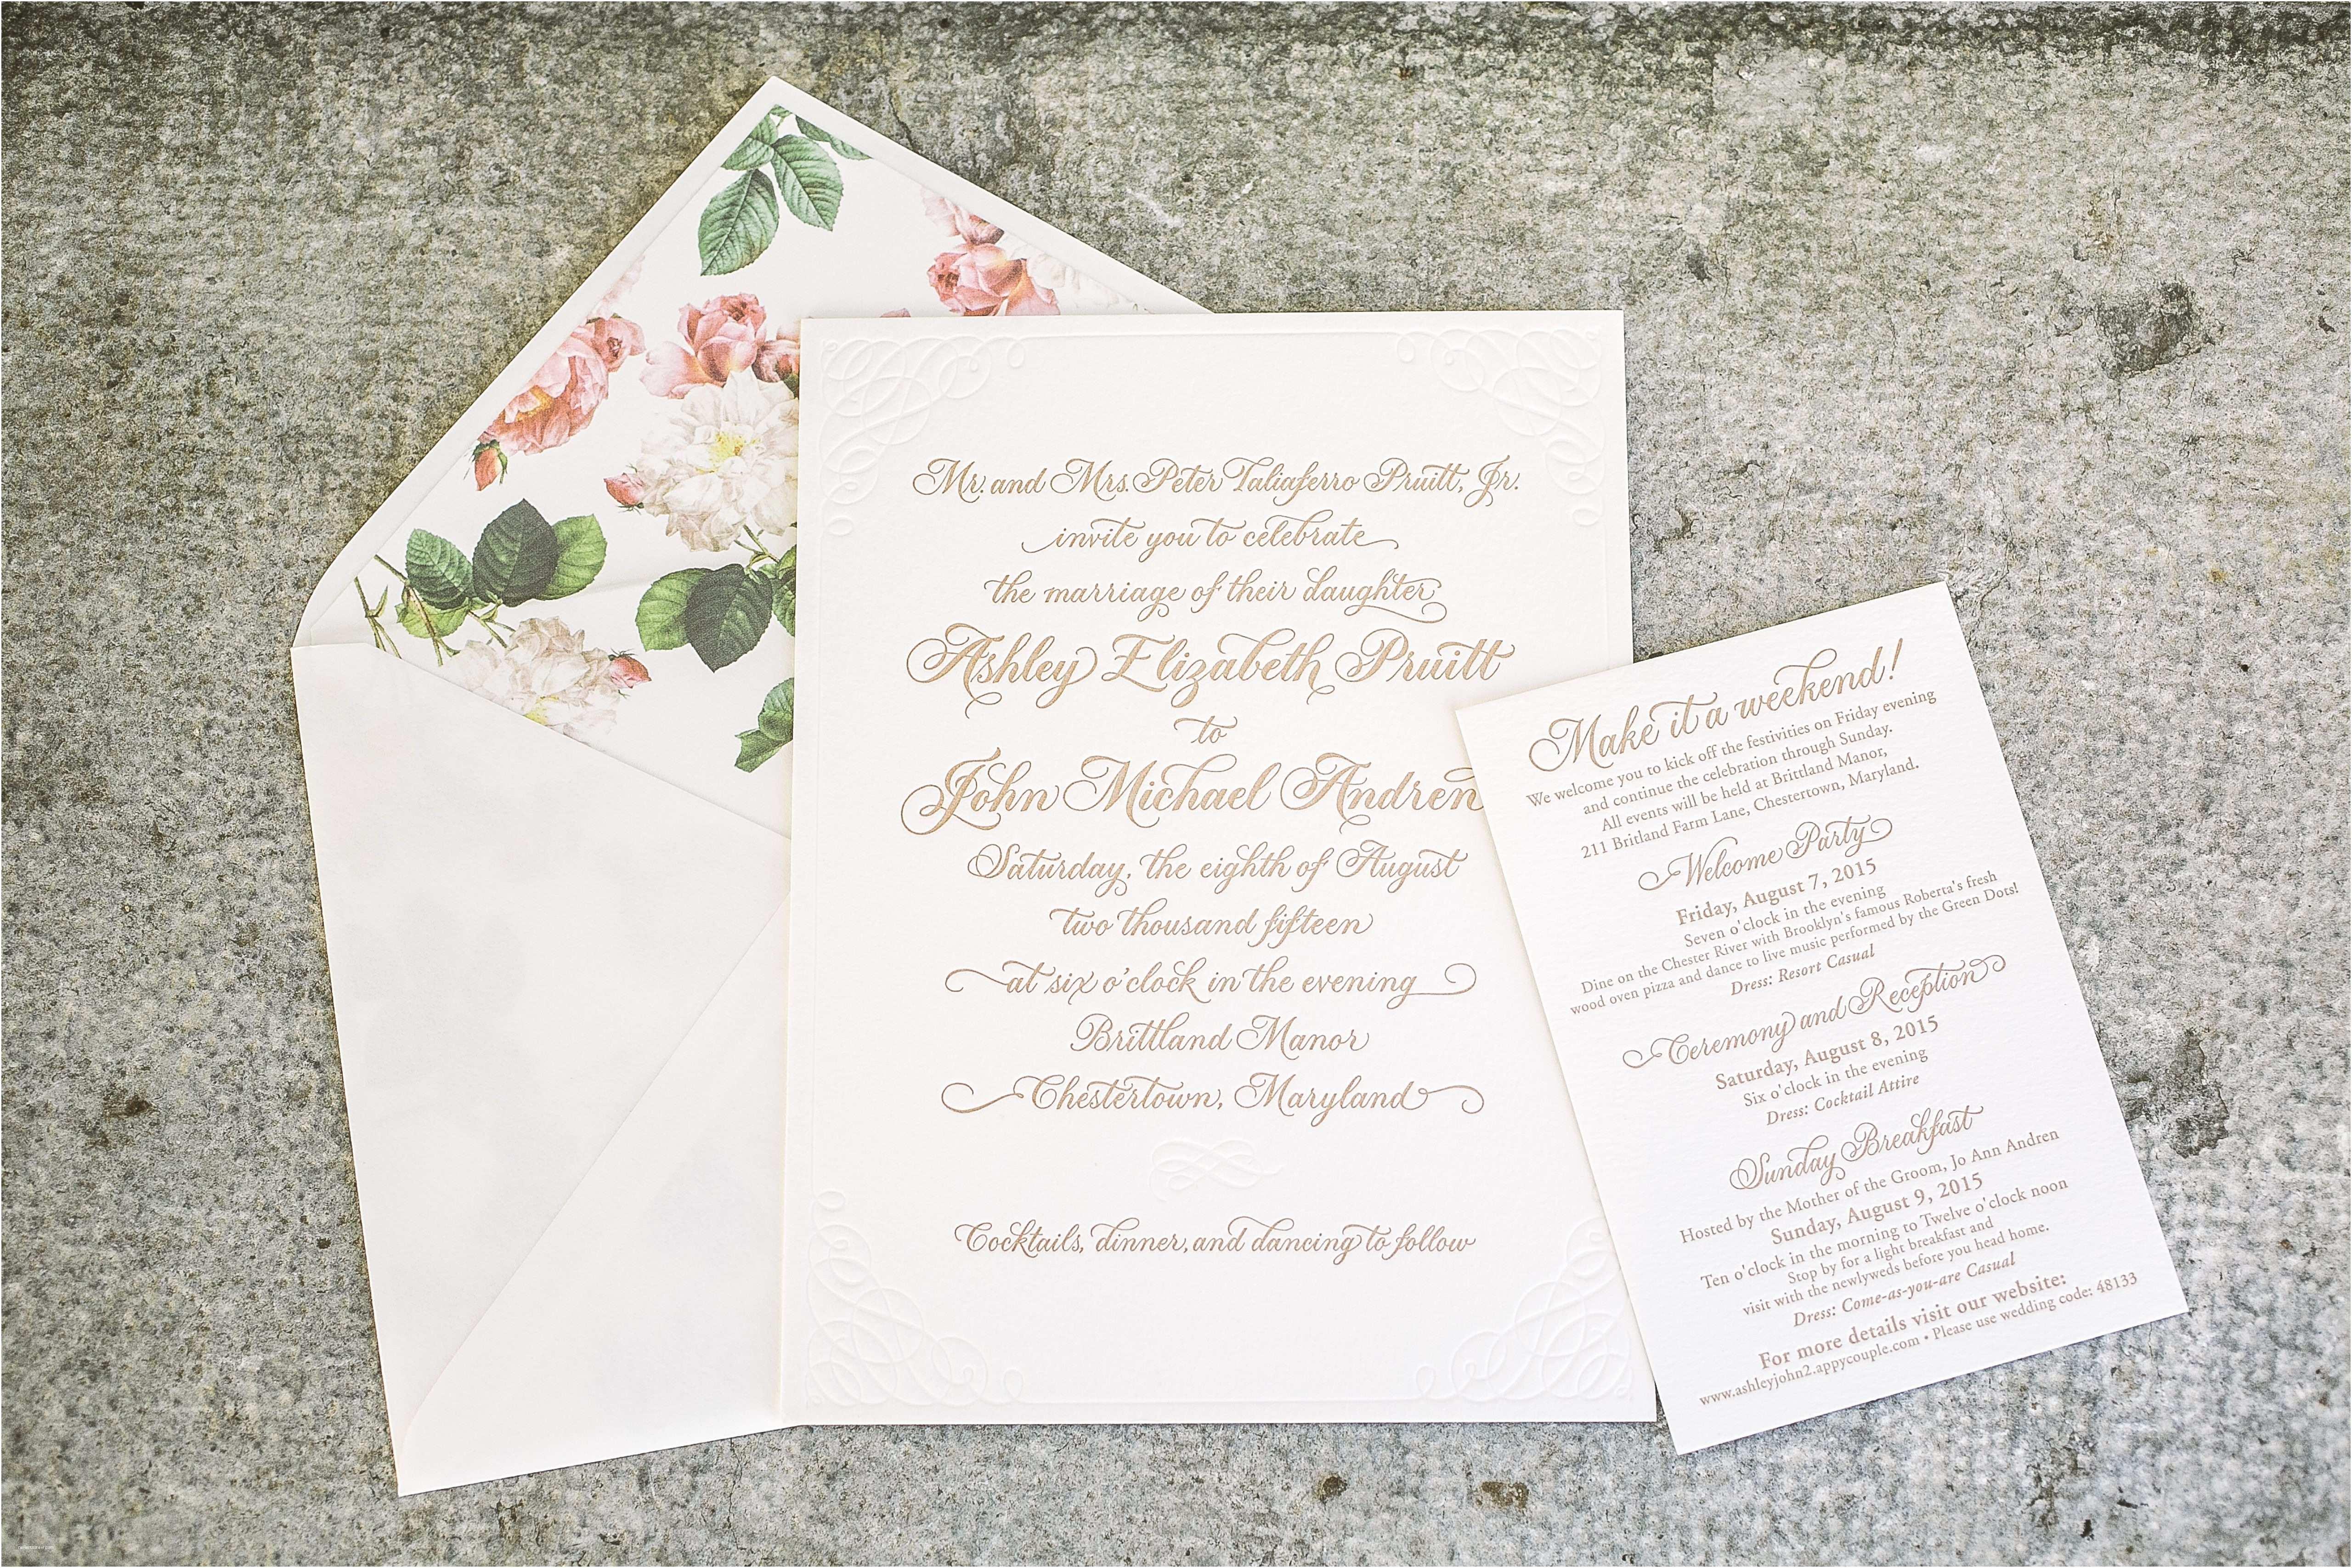 Wedding Invitation Calligraphy Romantic Letterpress Calligraphy Wedding Invitations